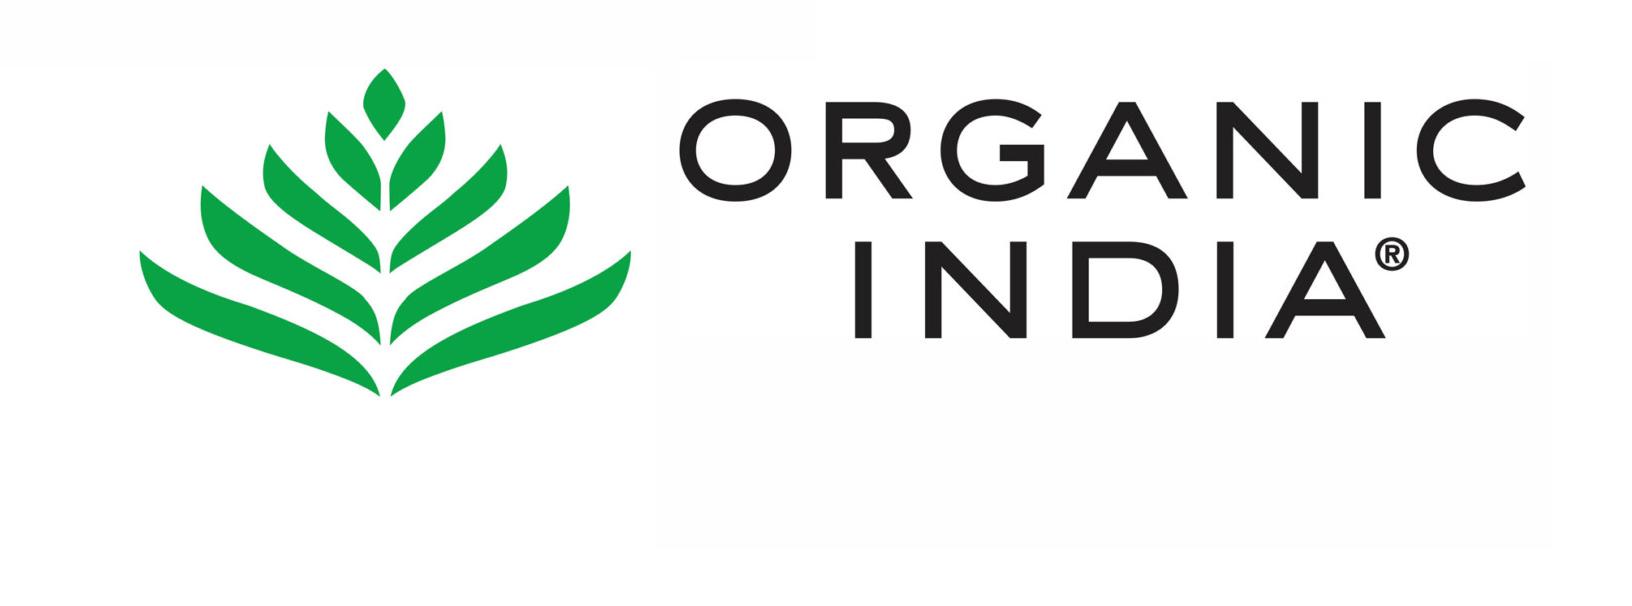 organic-india-logo3-hmpg